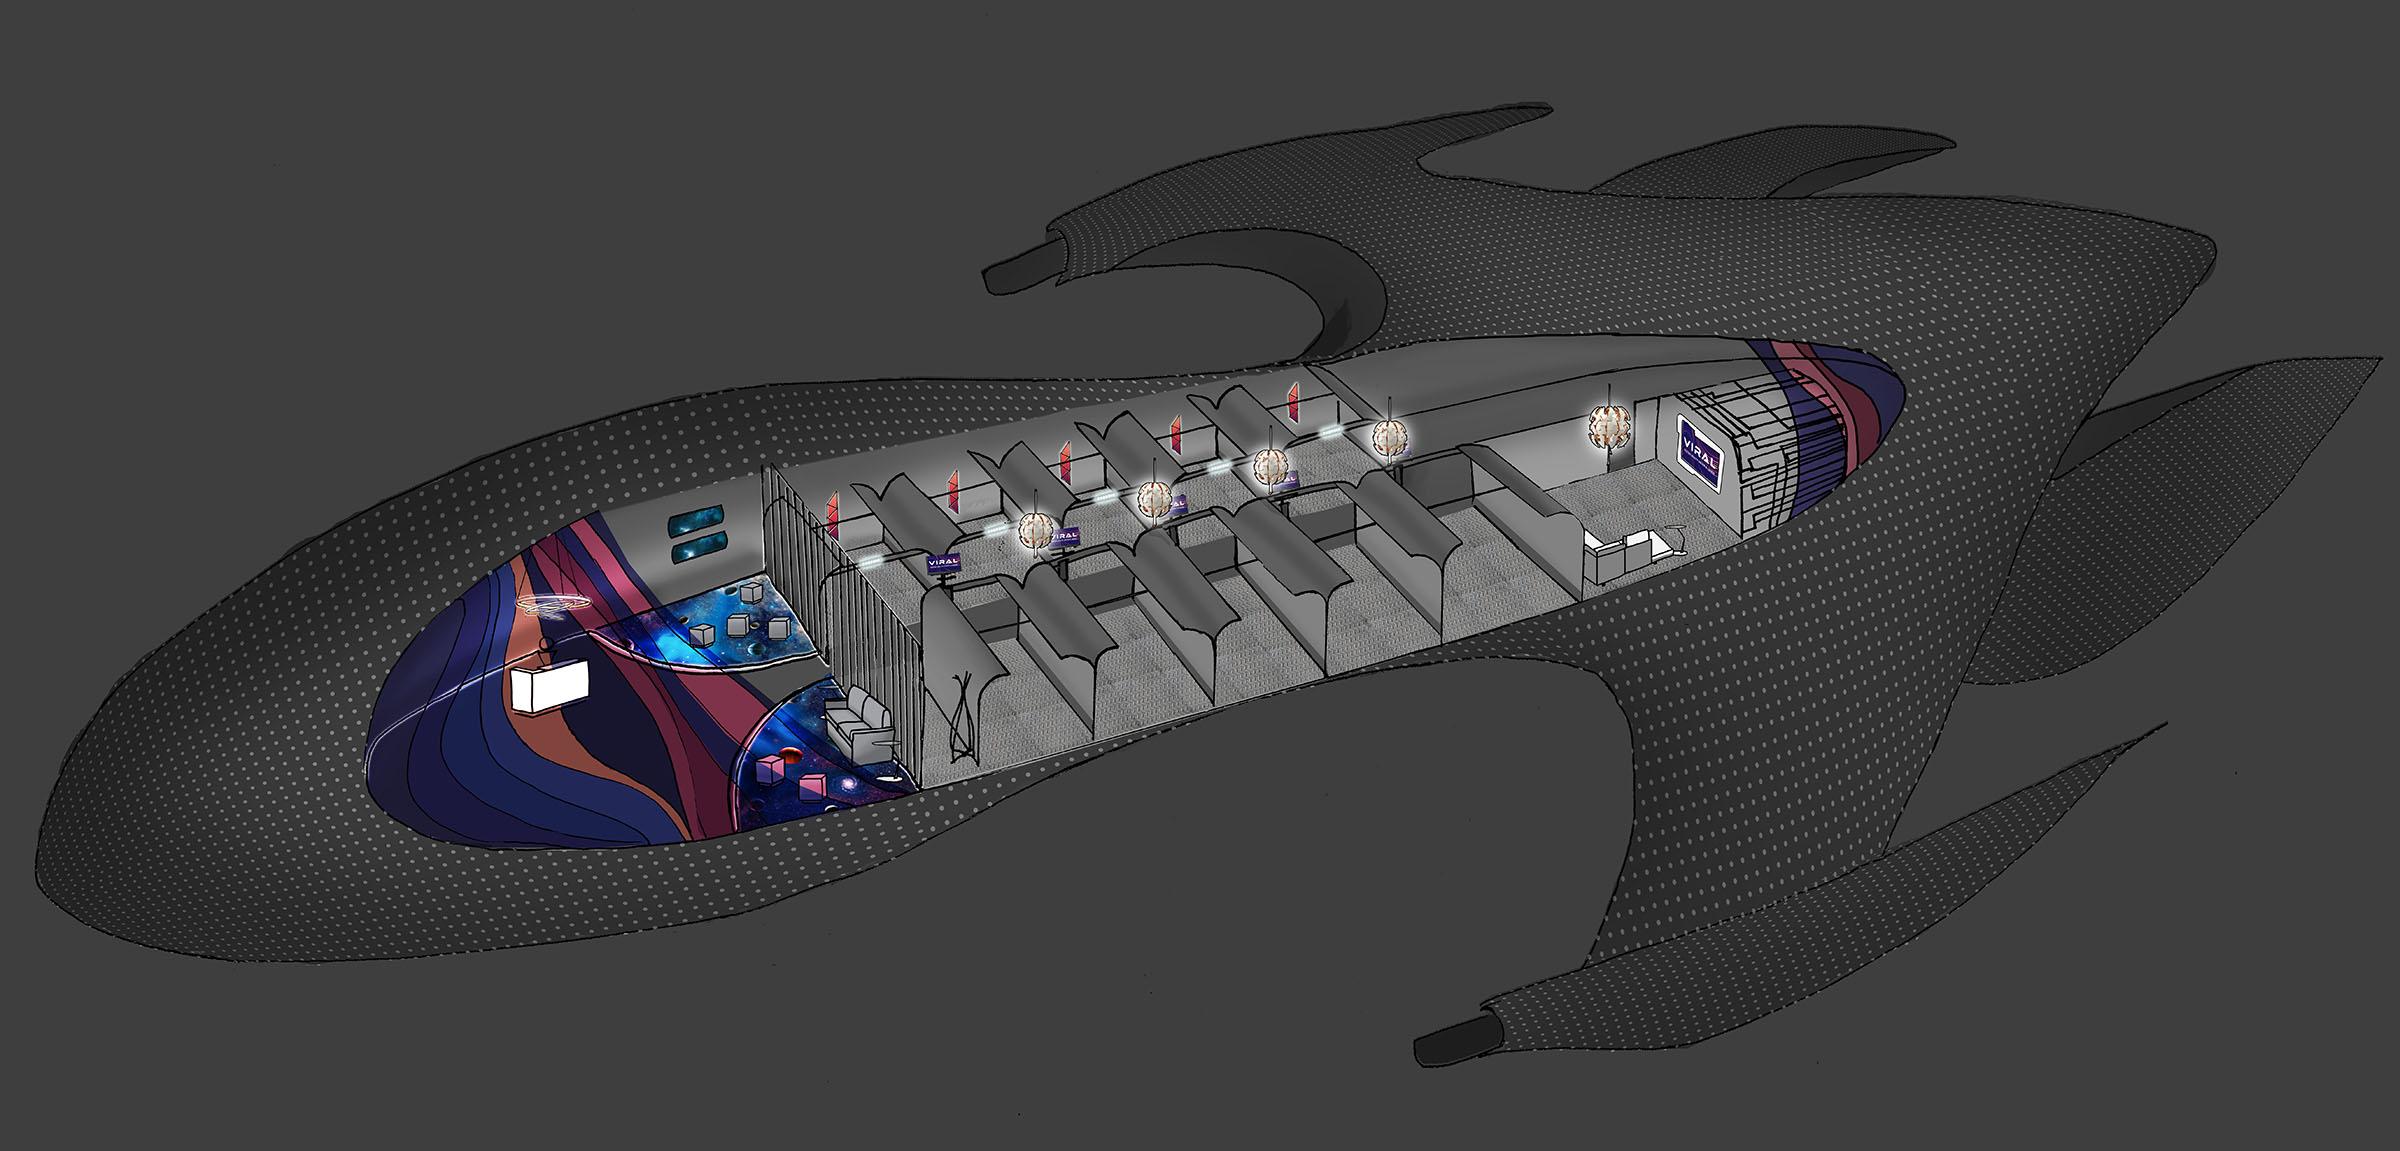 Interior Diagram for Web Use -Spaceship Illustration